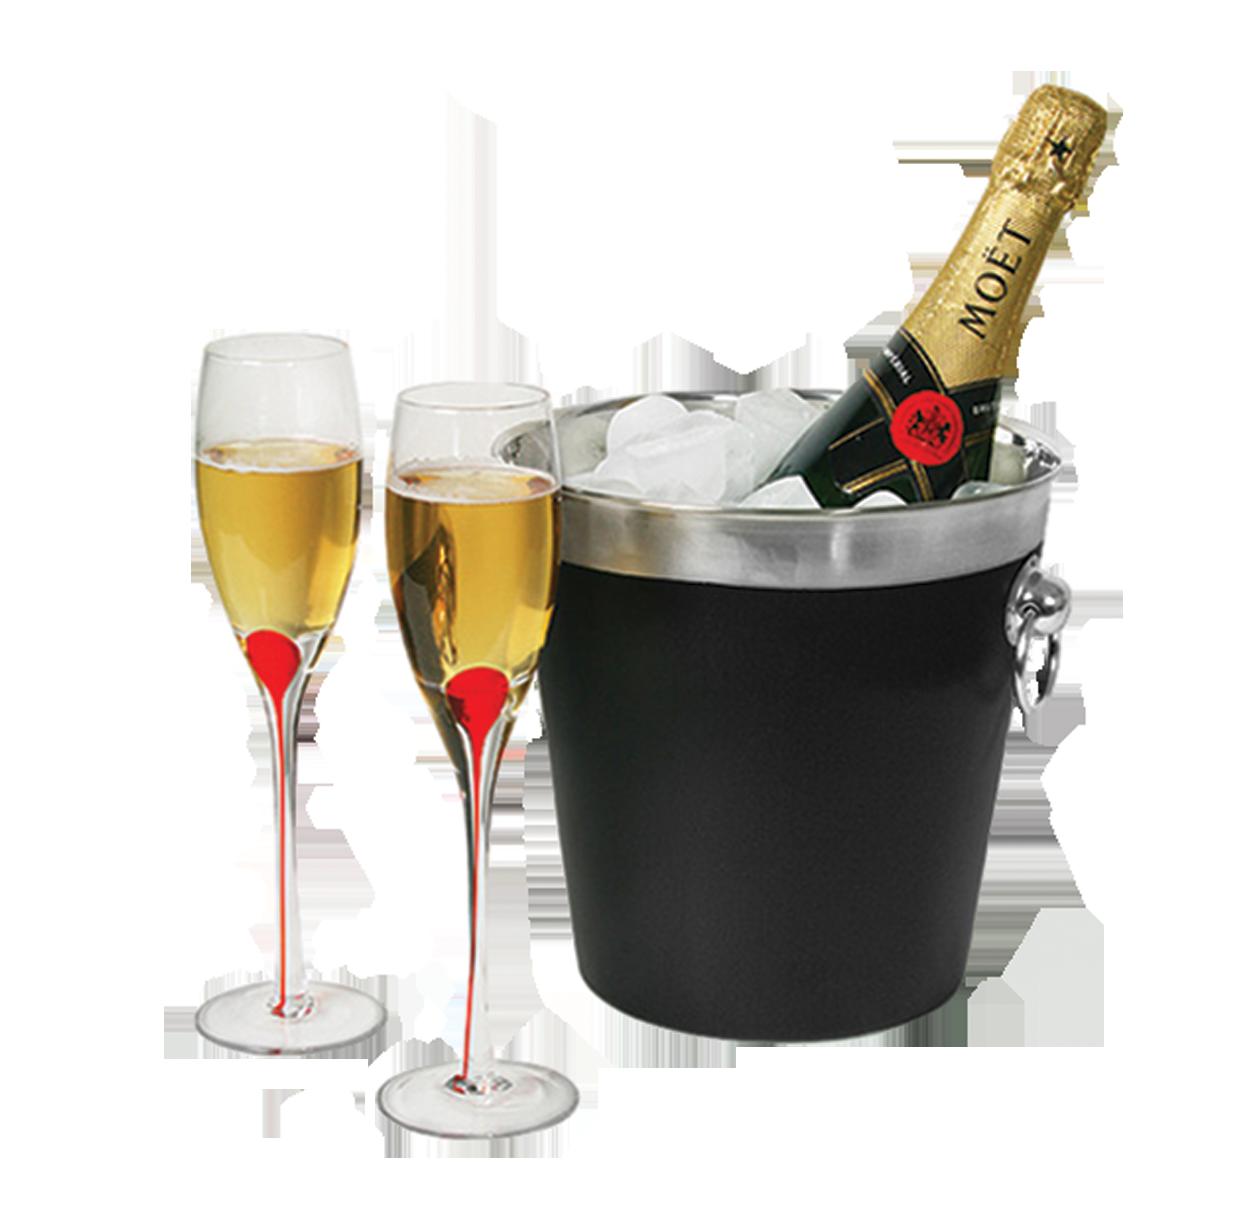 Champagne - arlequin - cap d'agde - port -